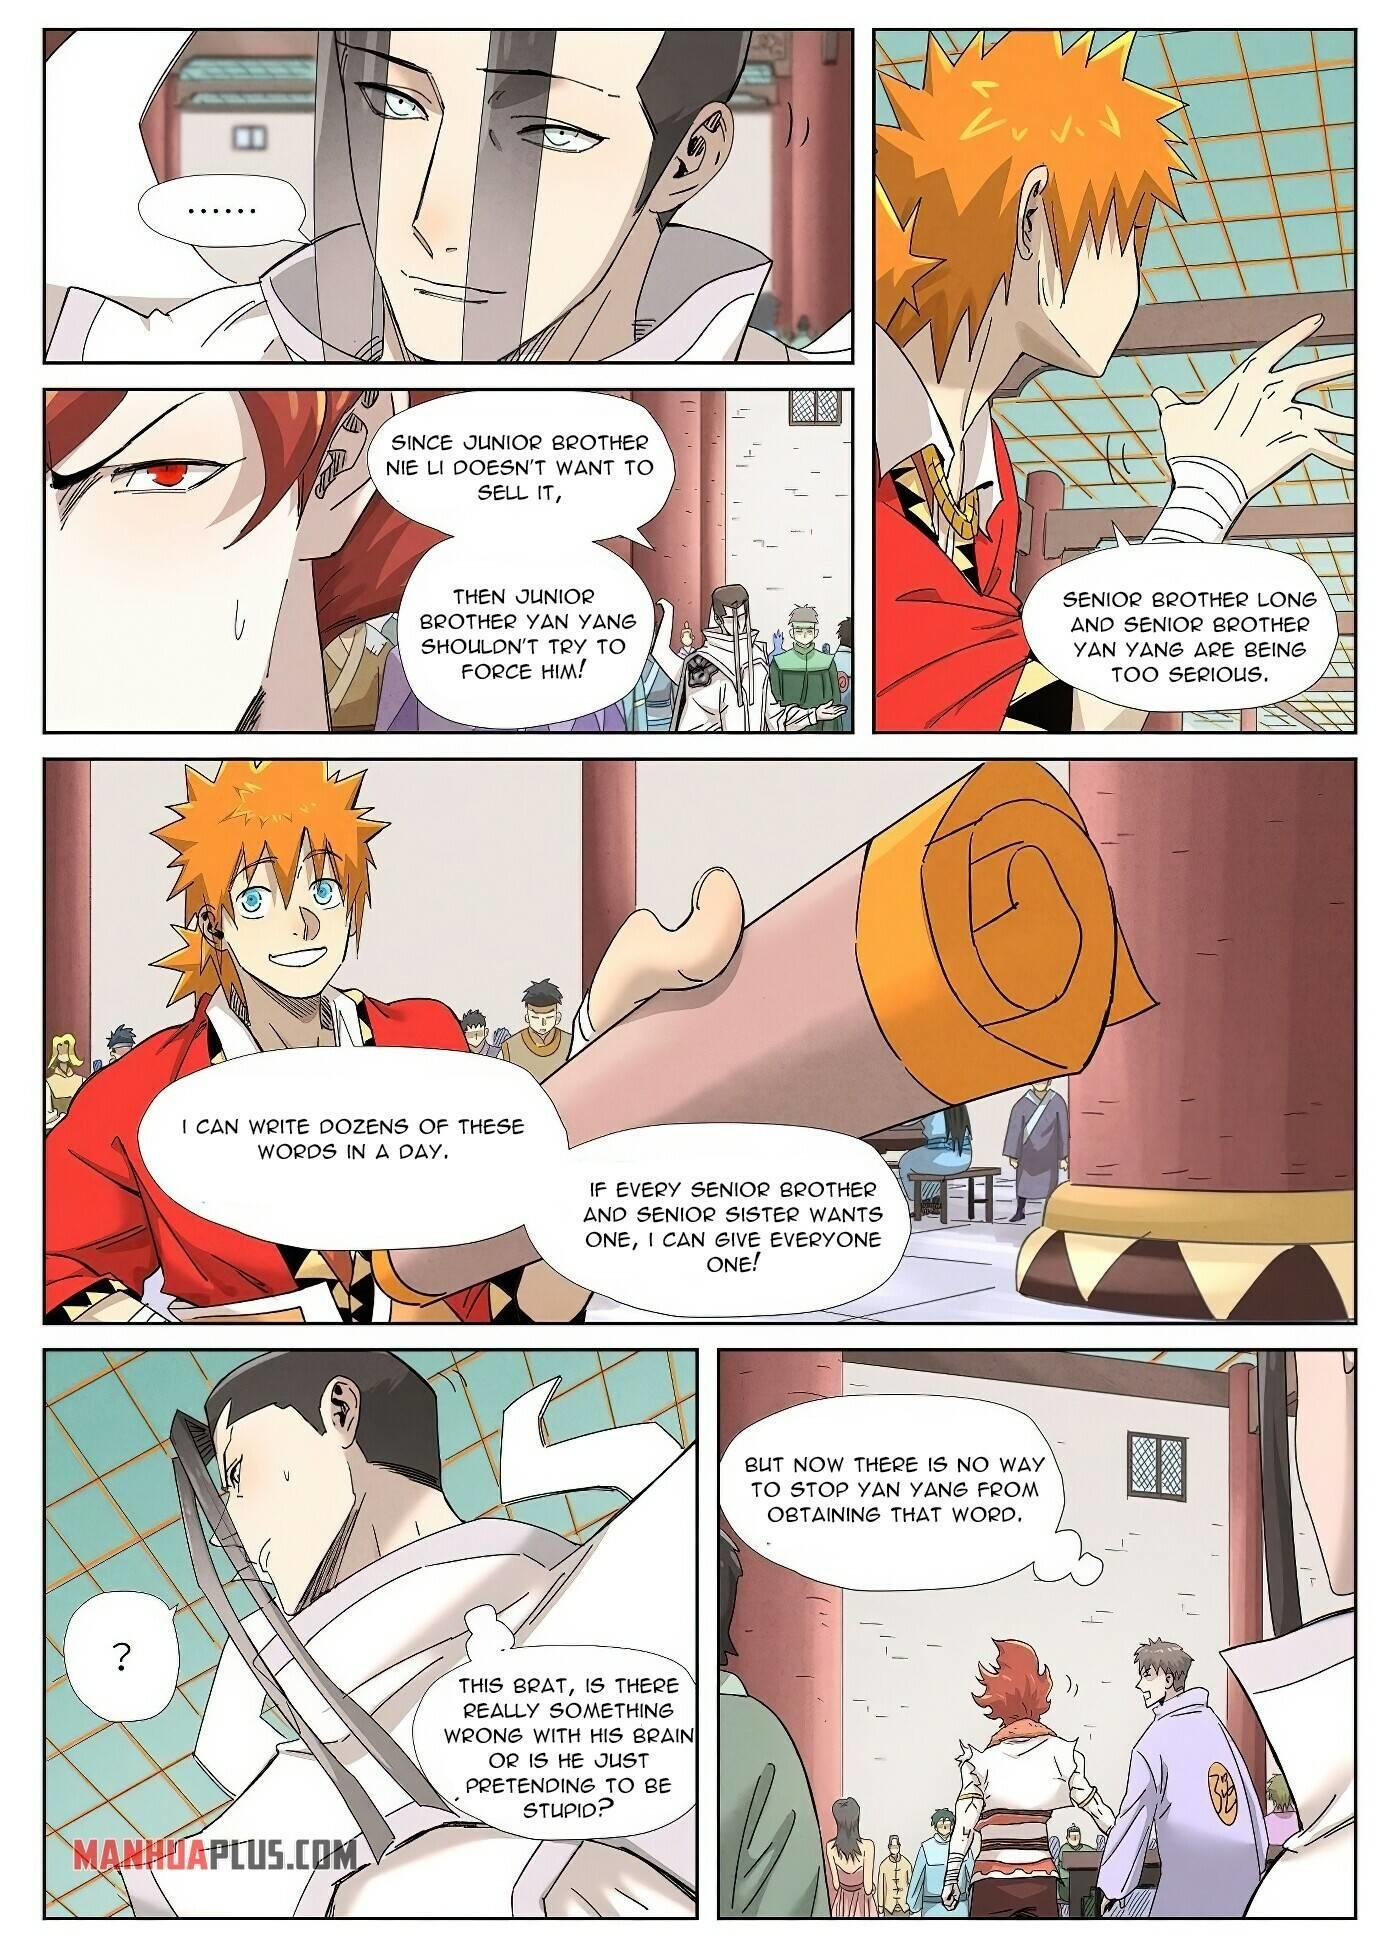 Tales Of Demons And Gods Chapter 342 page 4 - Mangakakalot